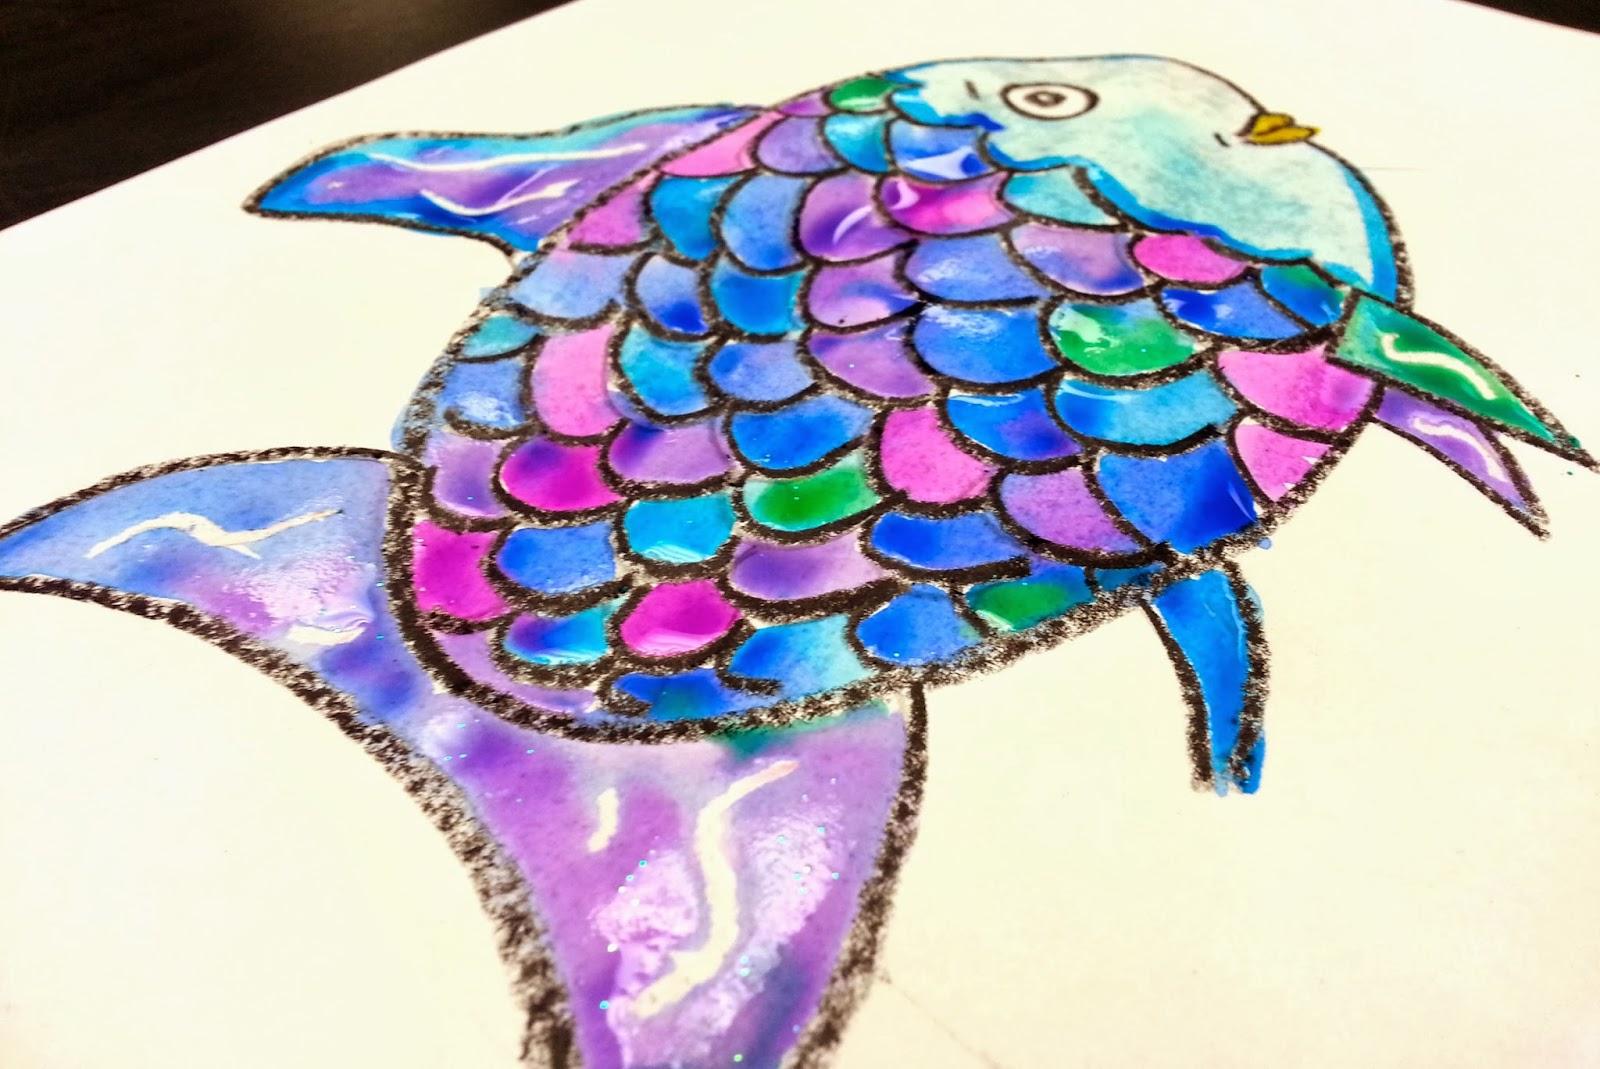 1600x1069 The Rainbow Fish (1st)